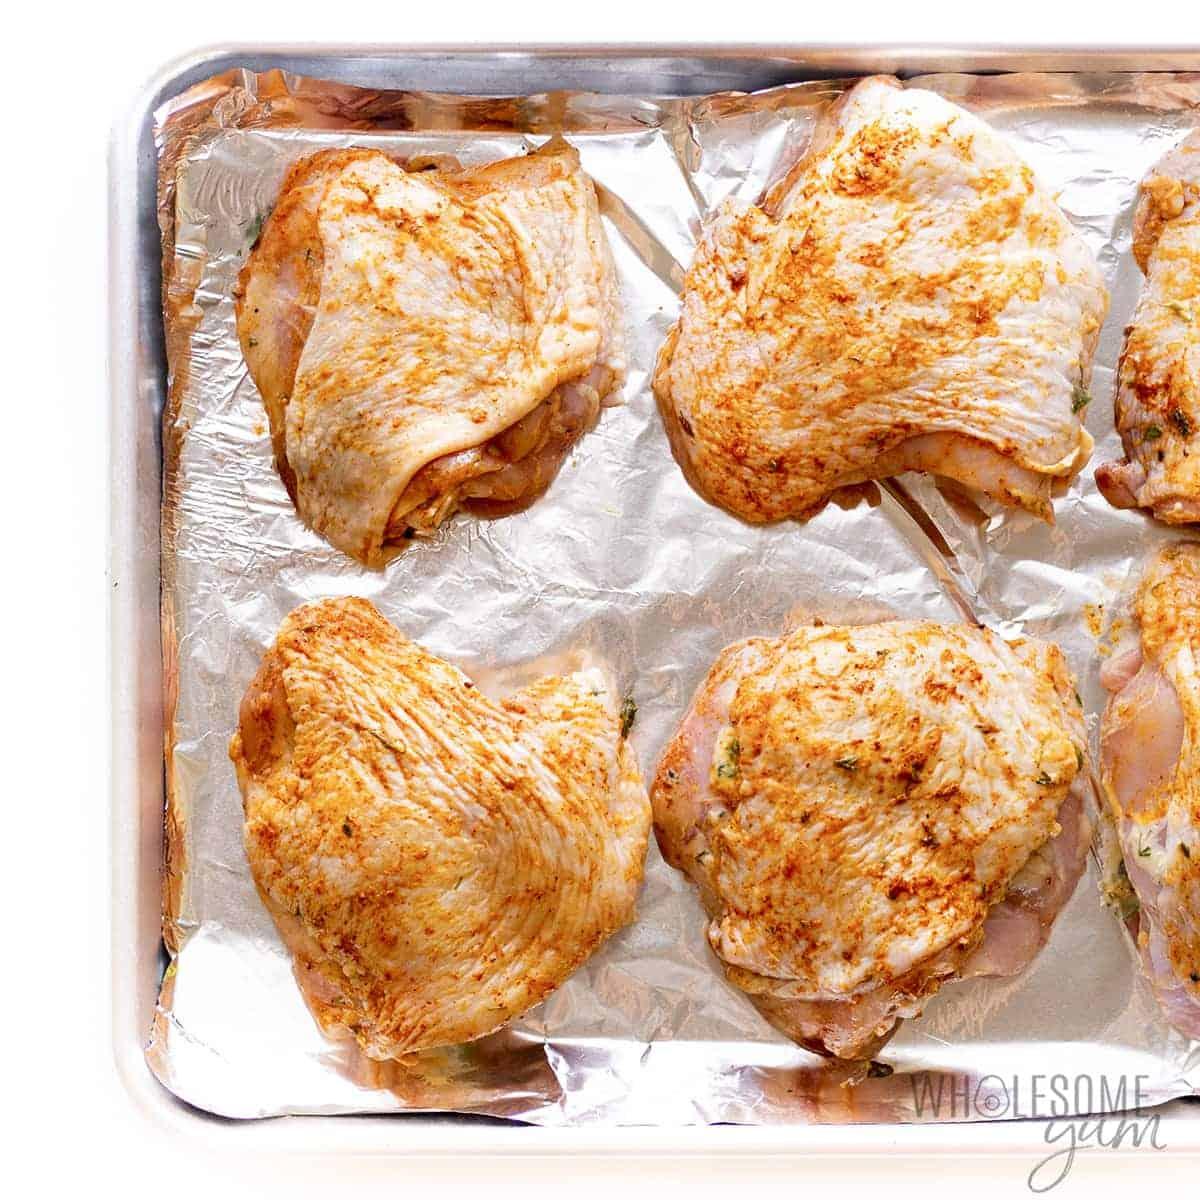 Seasoned chicken thighs on baking sheet